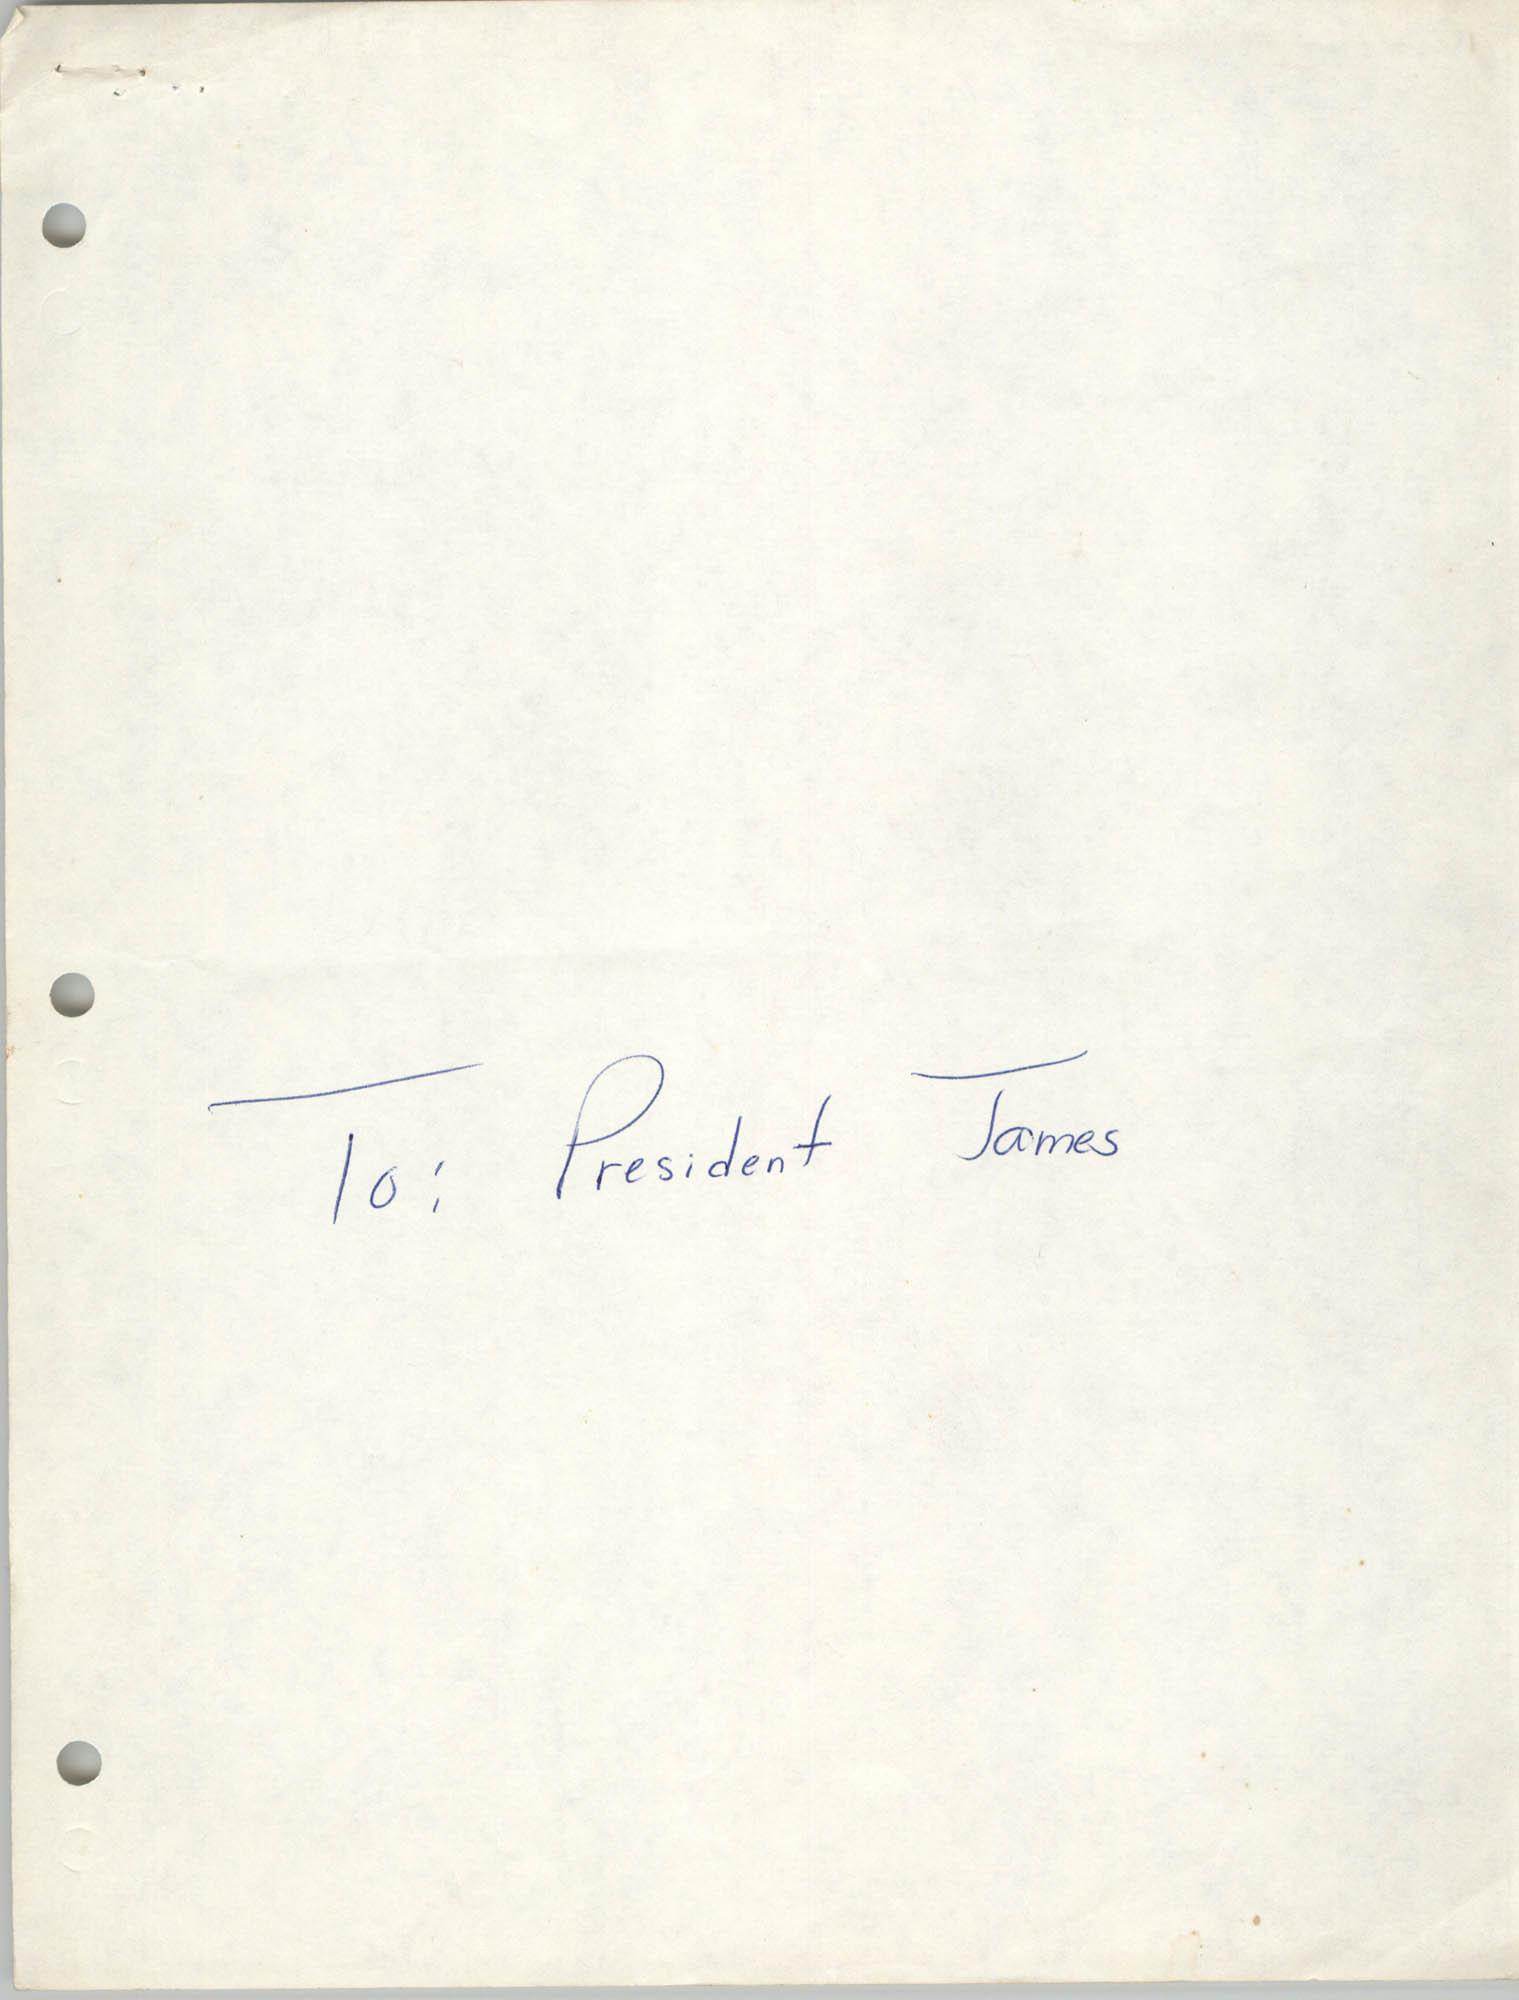 Charleston Branch of the NAACP Freedom Fund Committee Memorandum, March 3, 1989